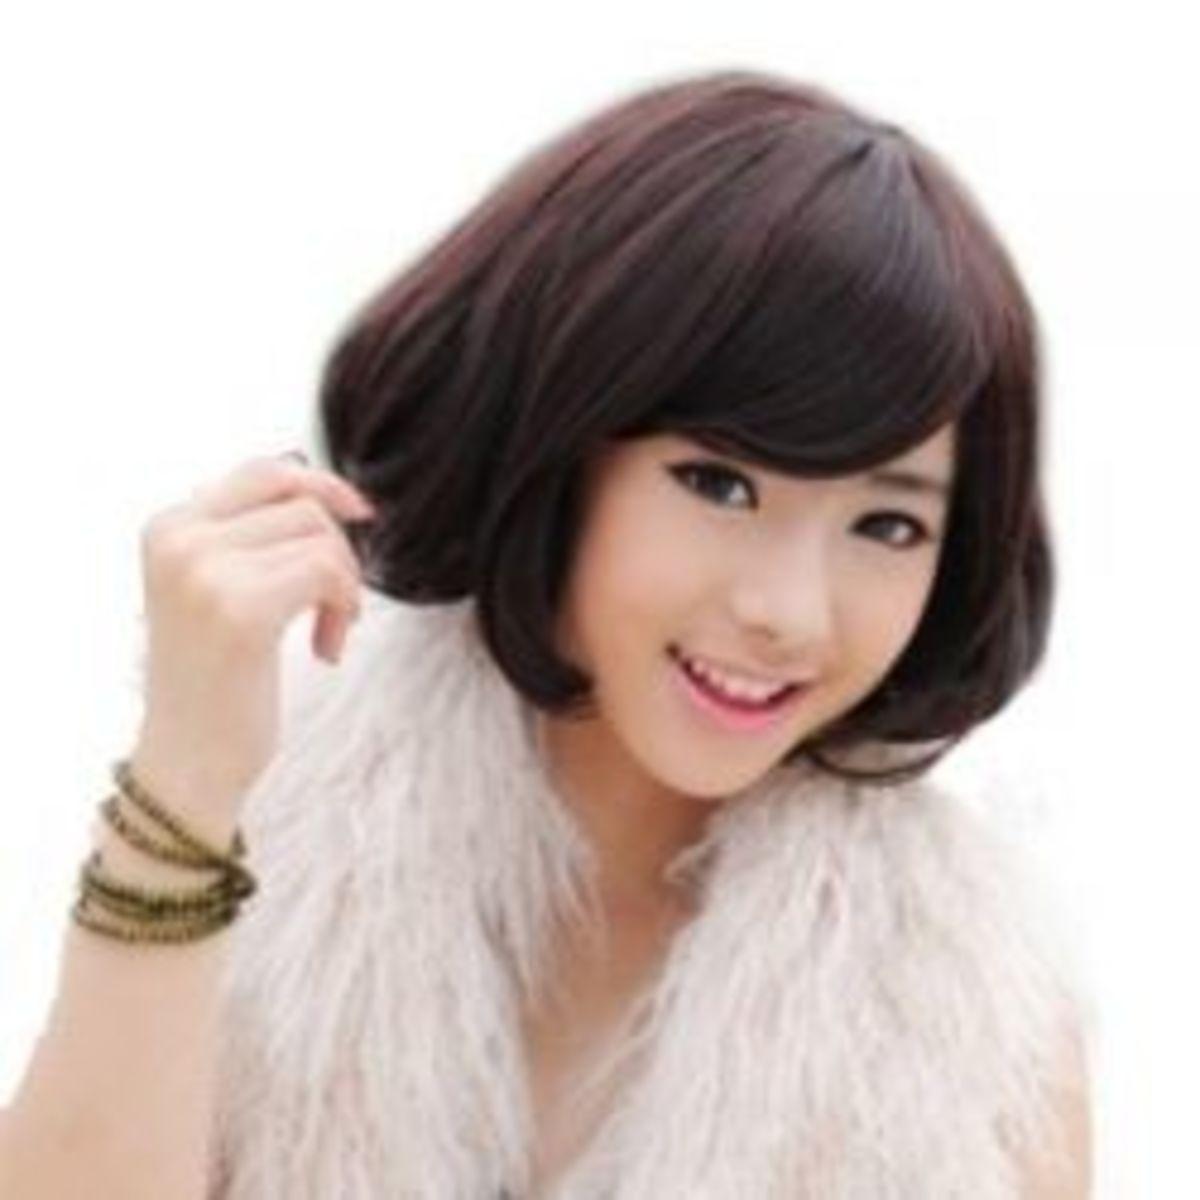 haircuts-for-girls